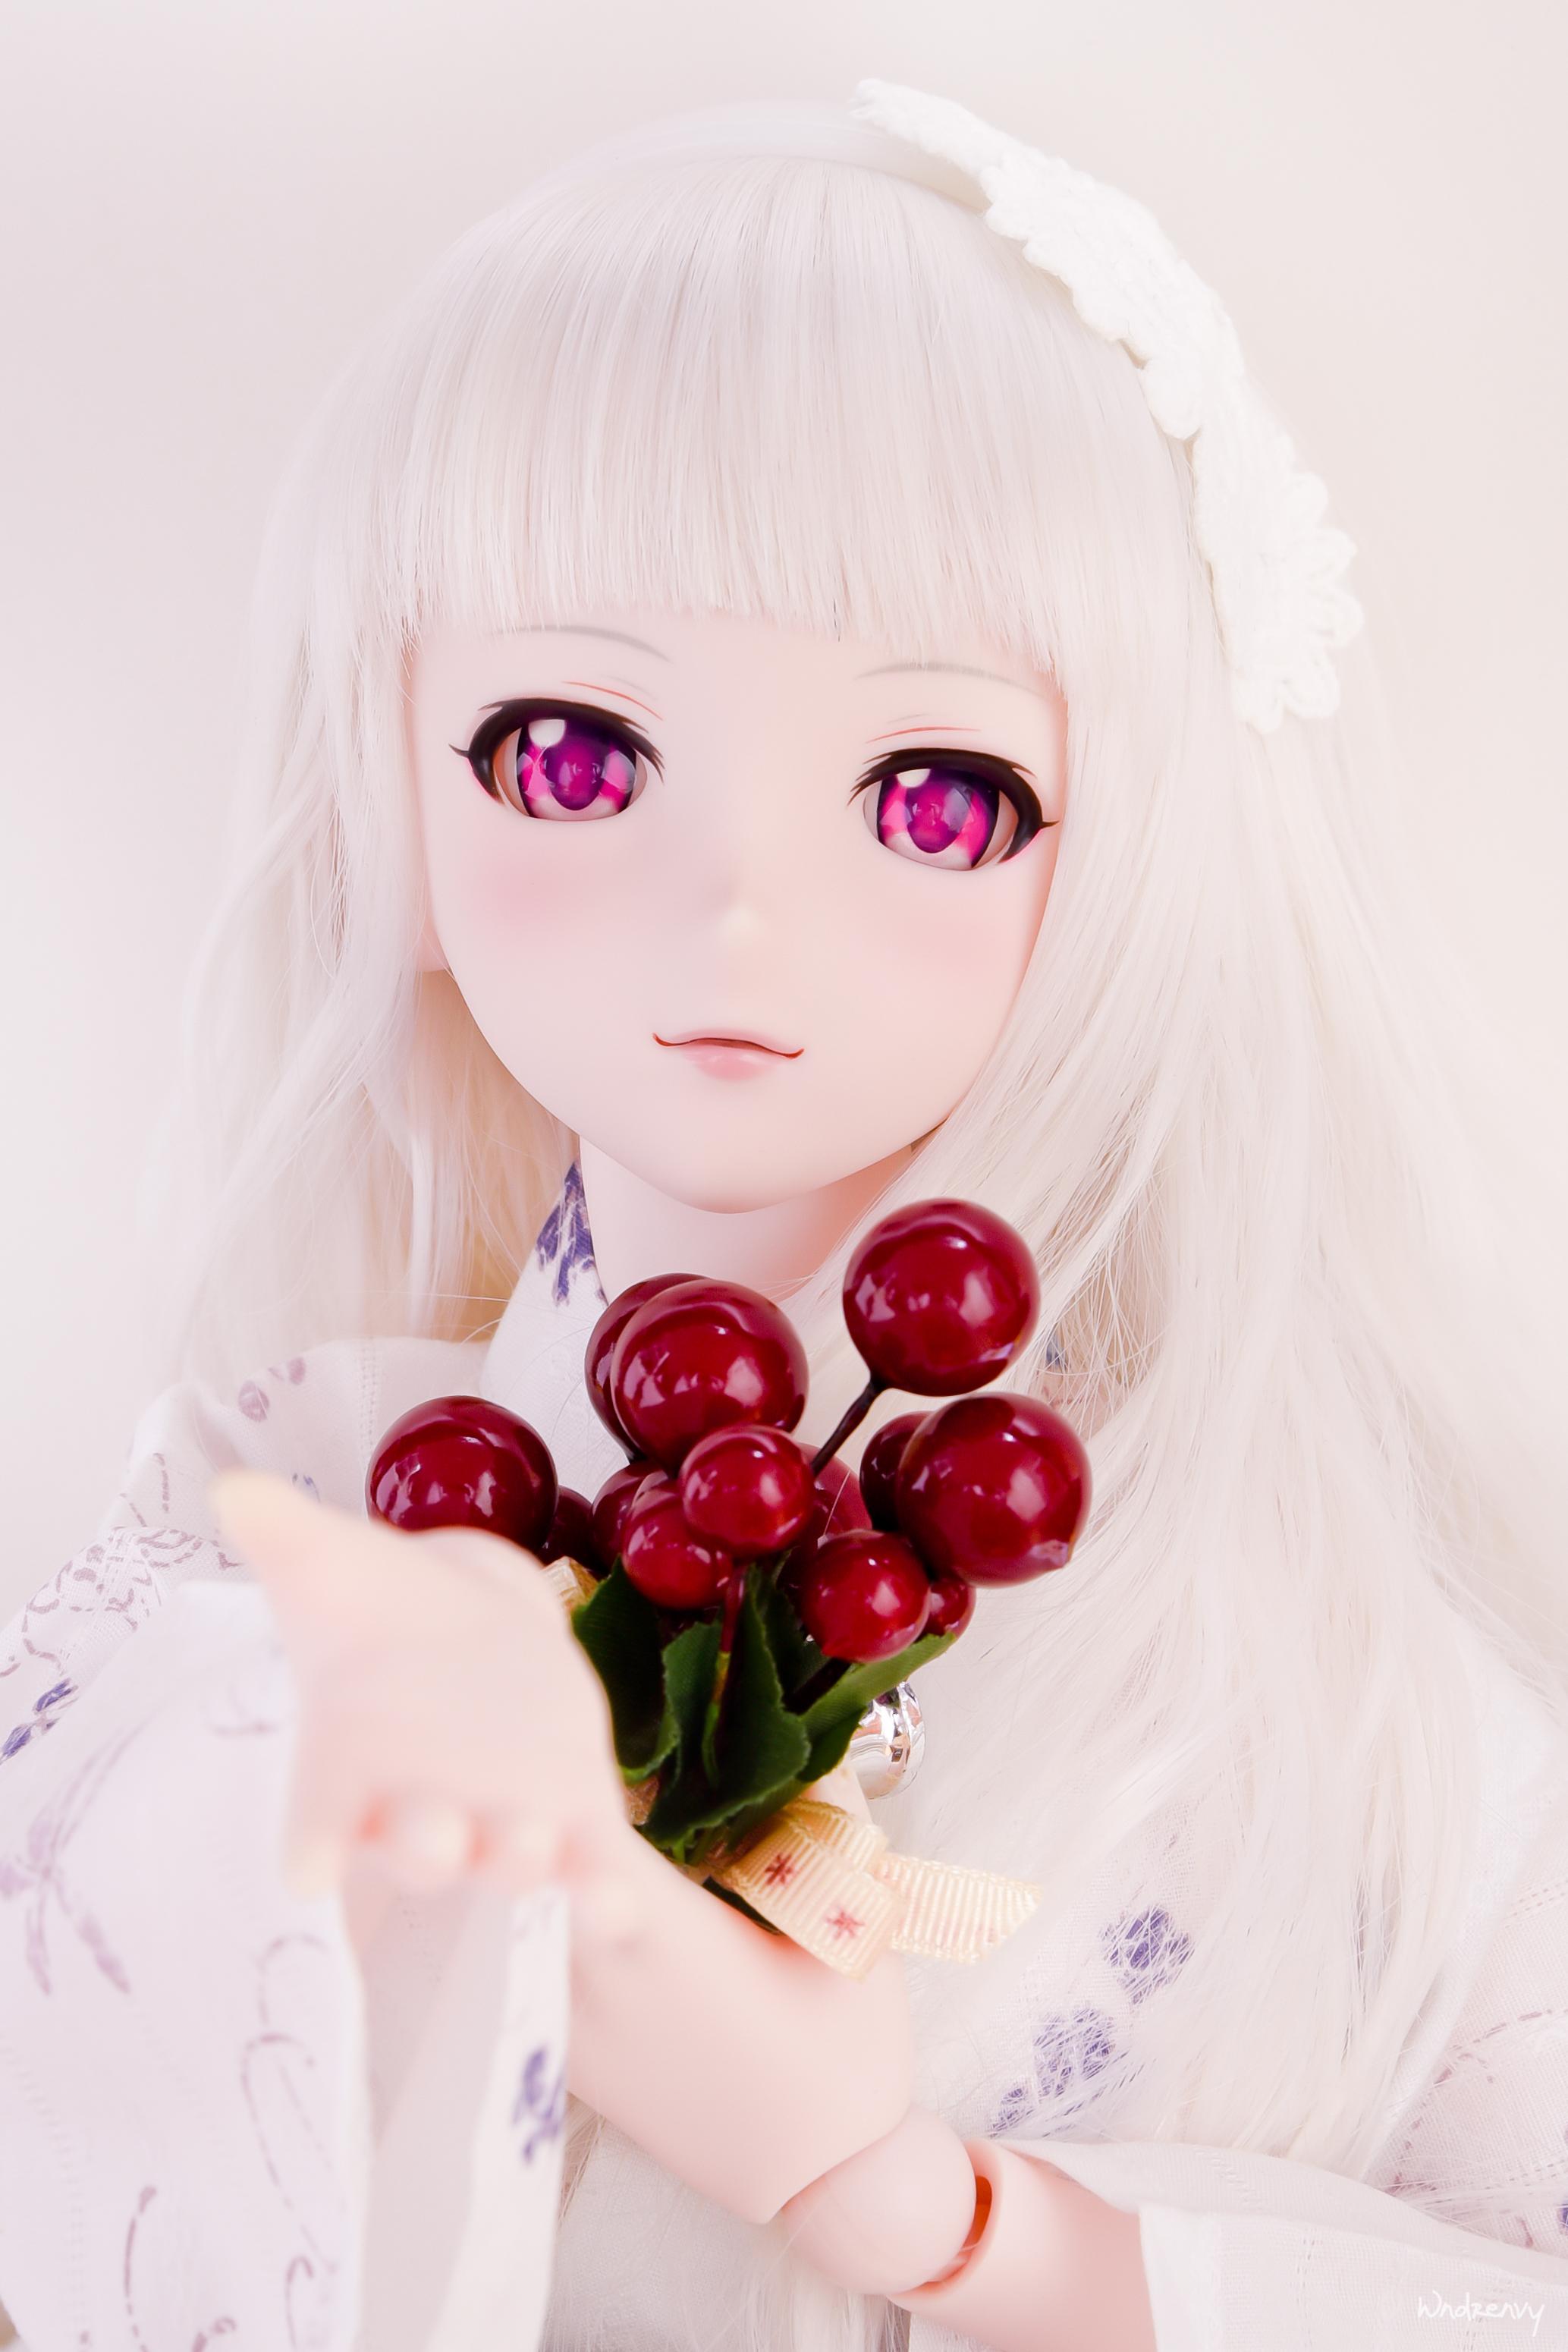 volks dollfie_dream shijou_takane misaki_serika the_idolmaster bandai_namco_games_inc.